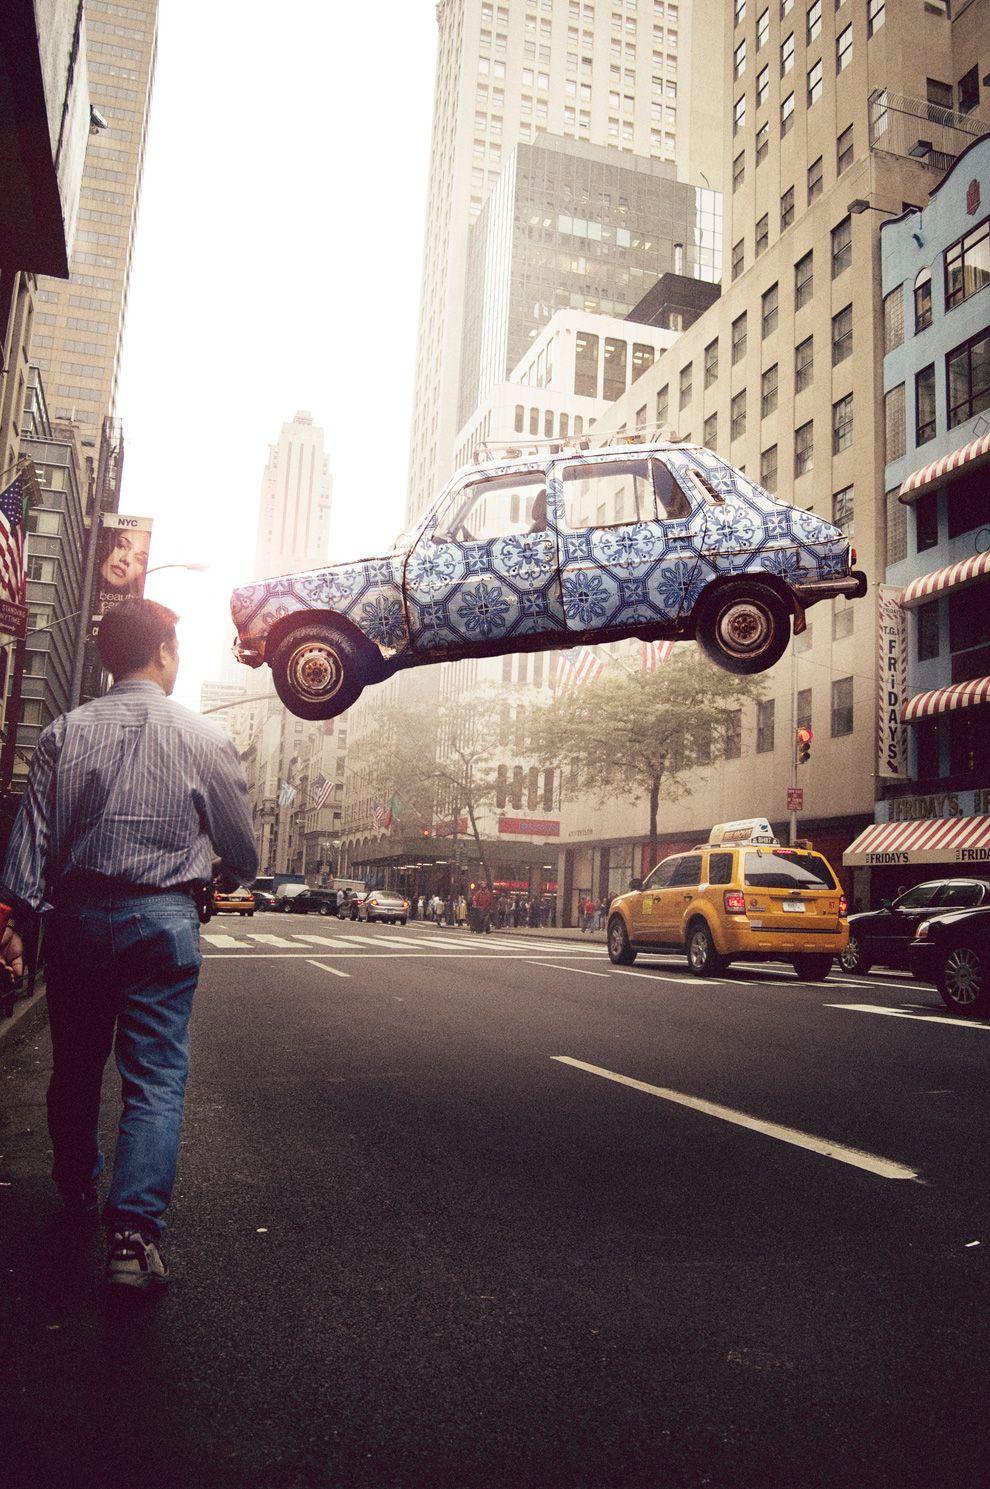 Jack Crossing Film Poster Design Graphic Design Art Cars